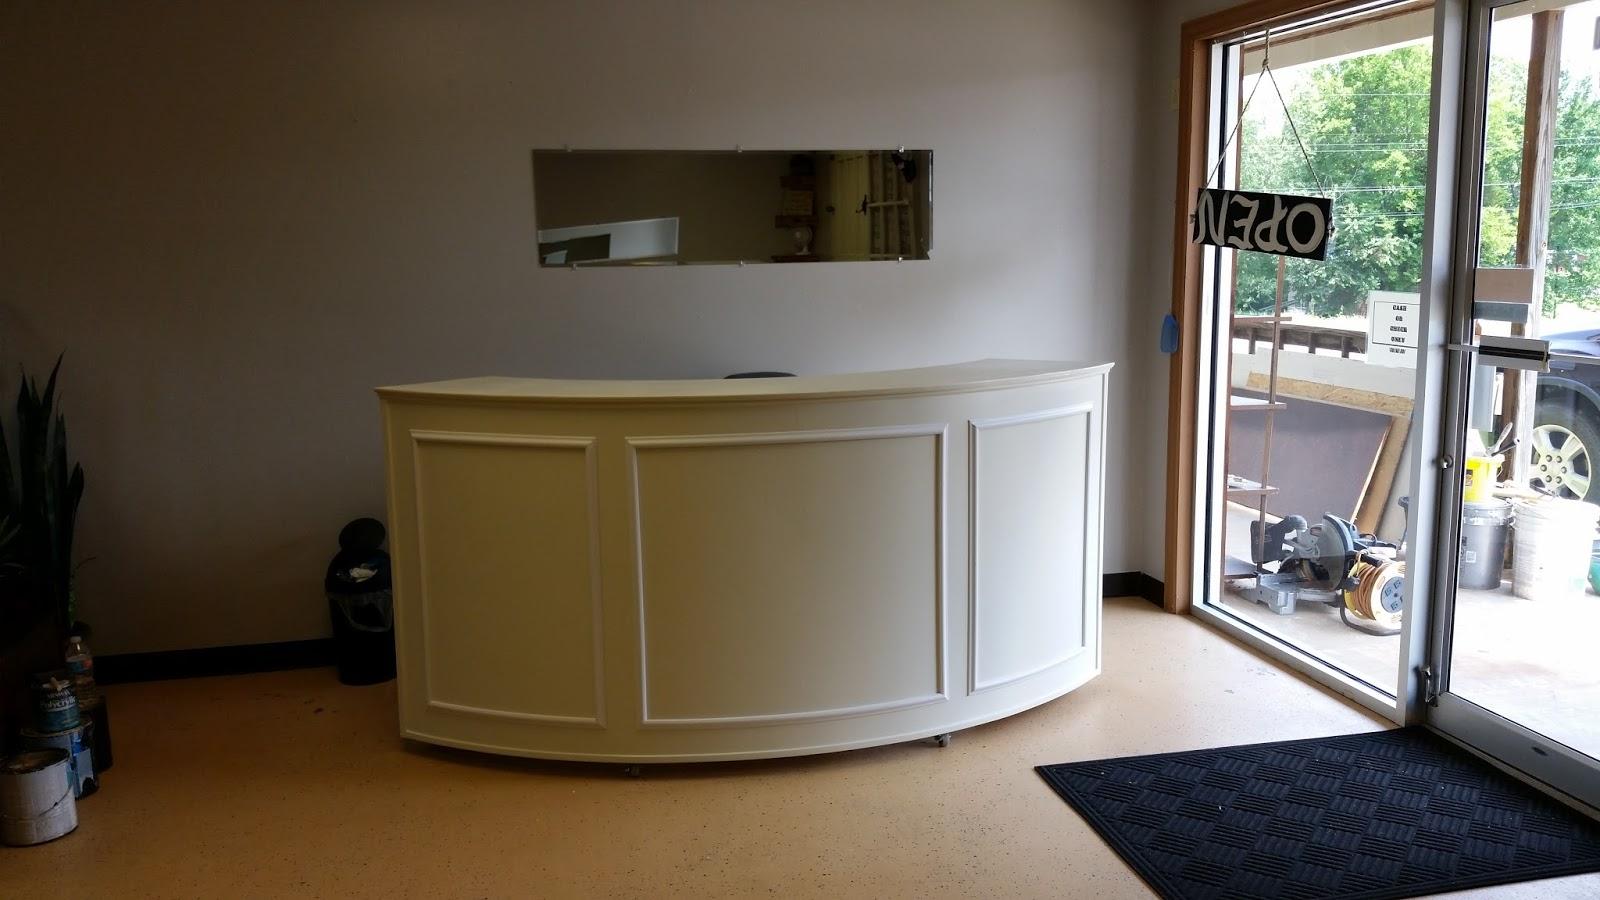 Handyman How 2: Building a Round Reception Desk